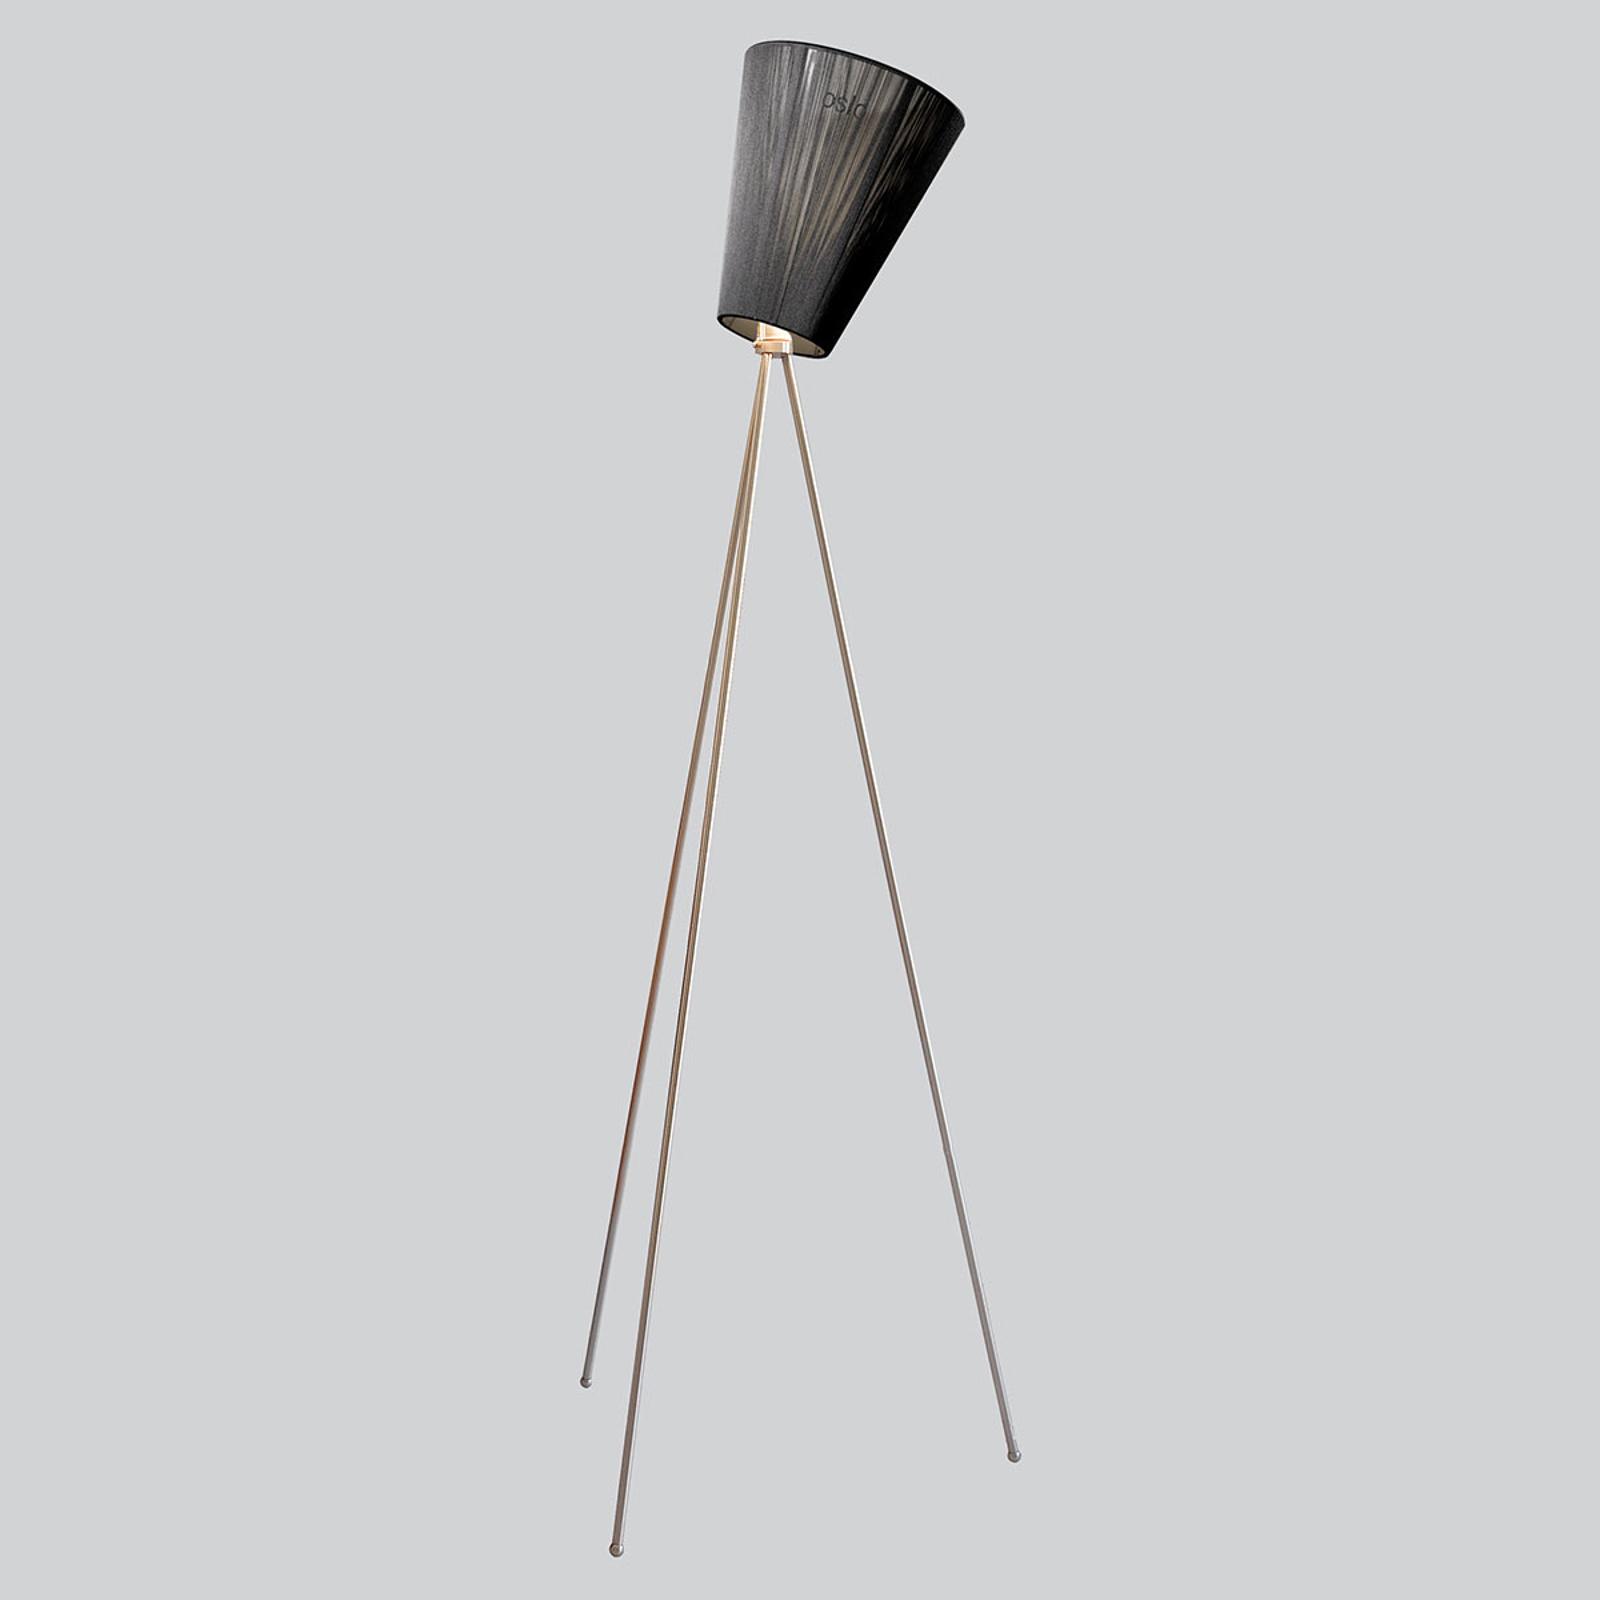 Northern Oslo Wood vloerlamp staal/zwart